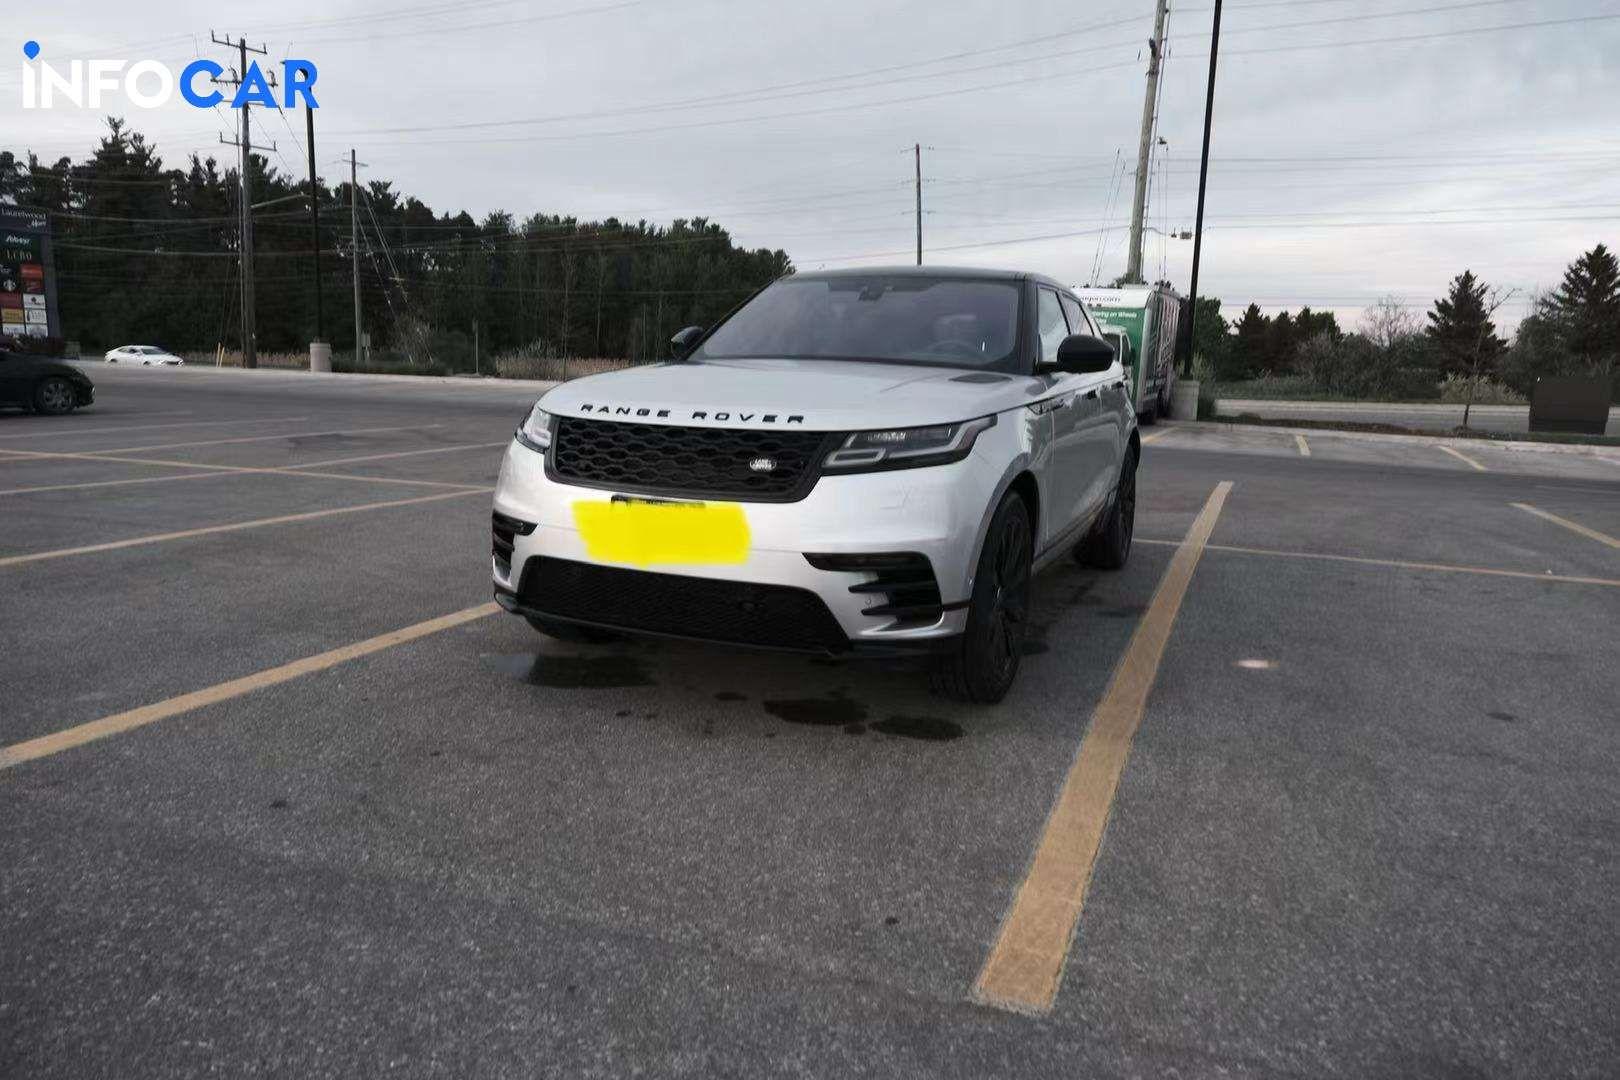 2019 Land Rover Range Rover Velar p340 se - INFOCAR - Toronto's Most Comprehensive New and Used Auto Trading Platform